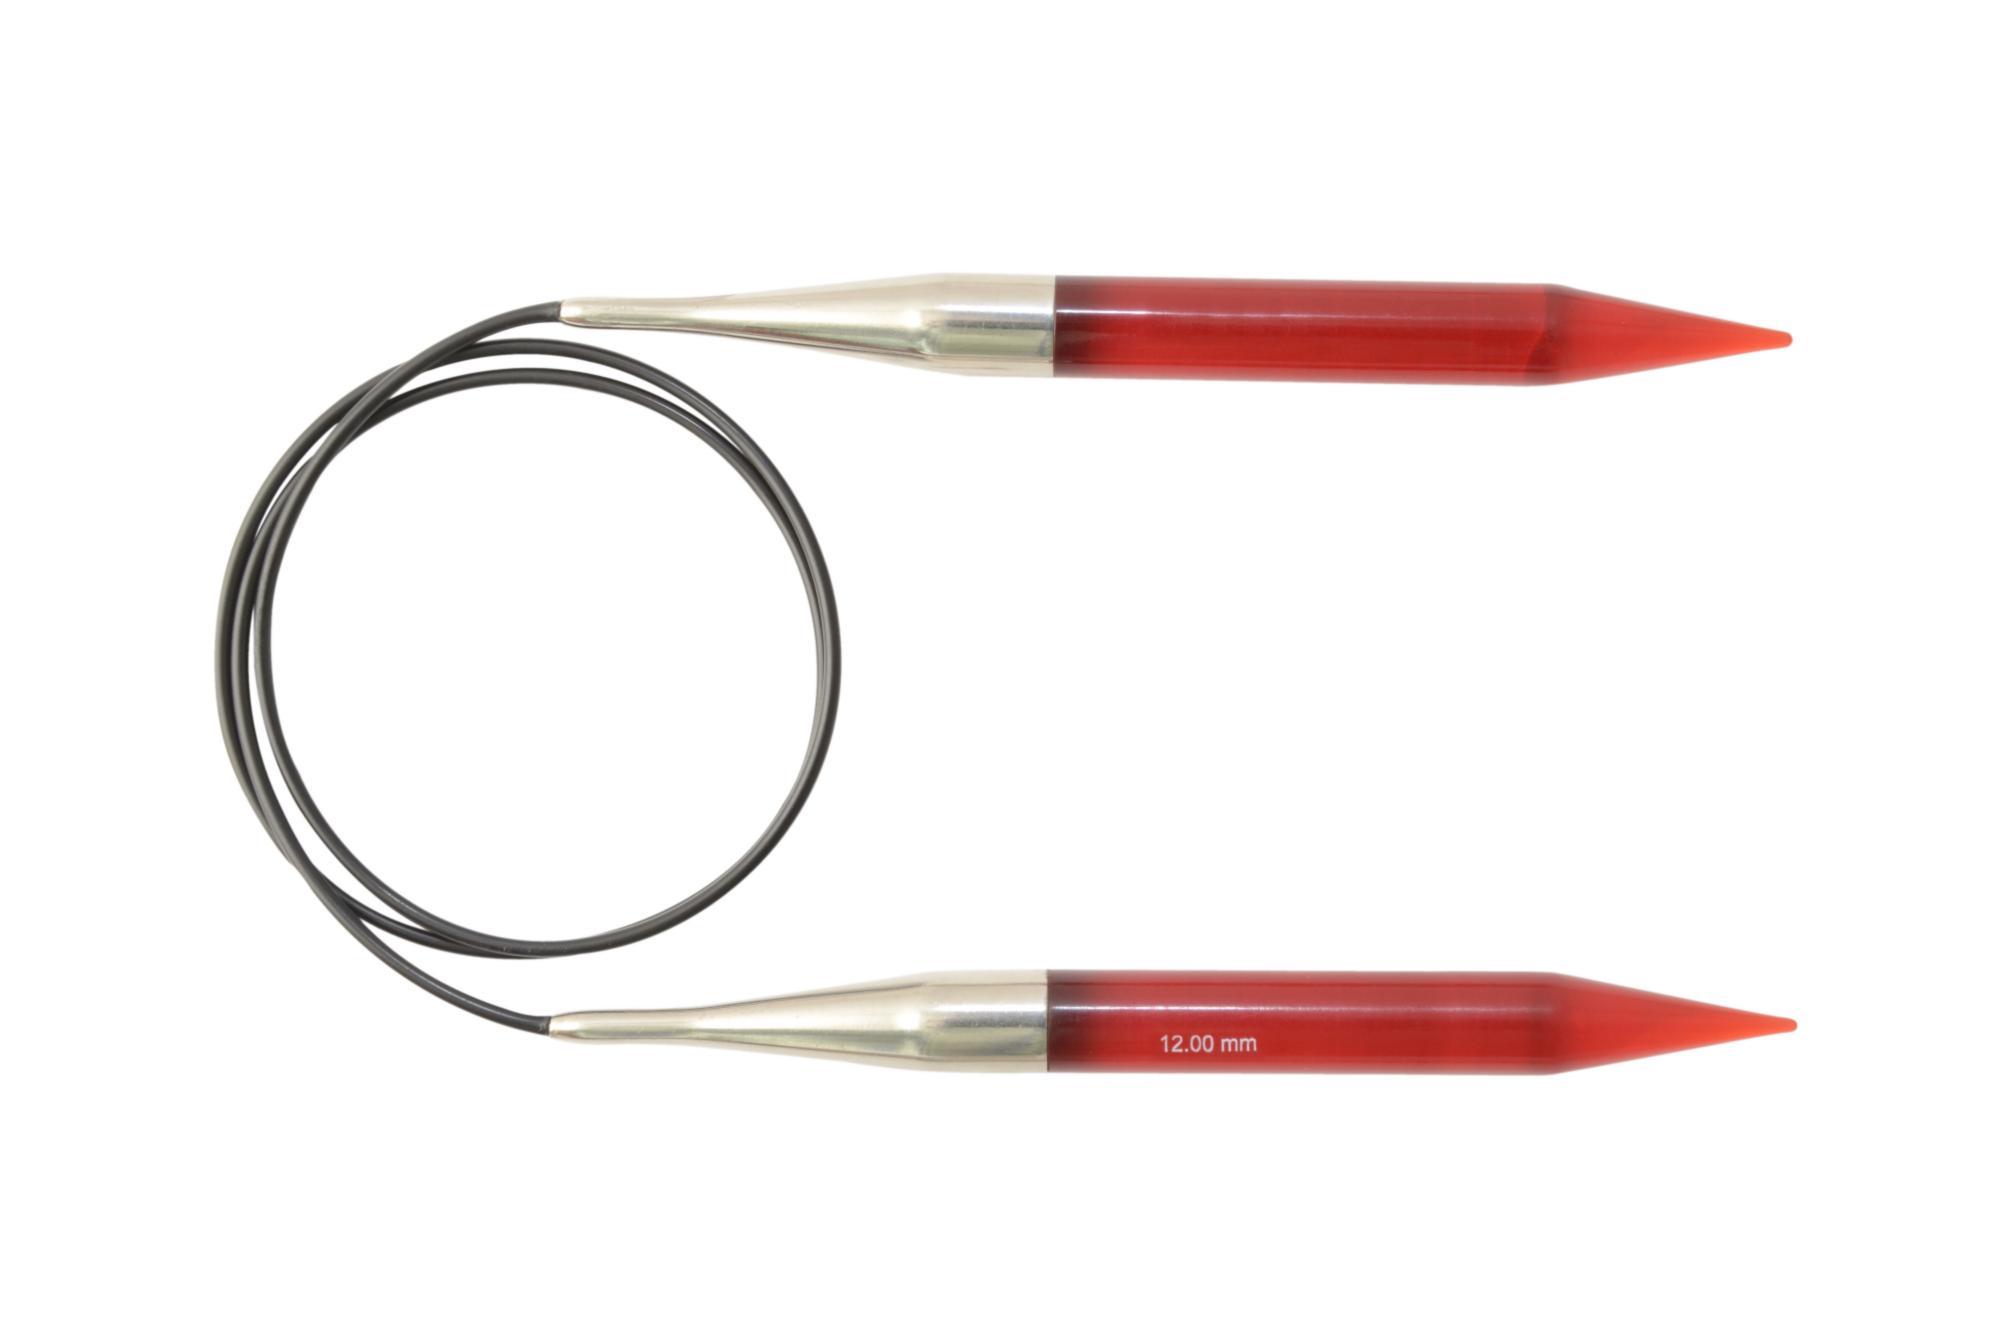 Спицы круговые 60 см Trendz KnitPro, 51063, 12.00 мм